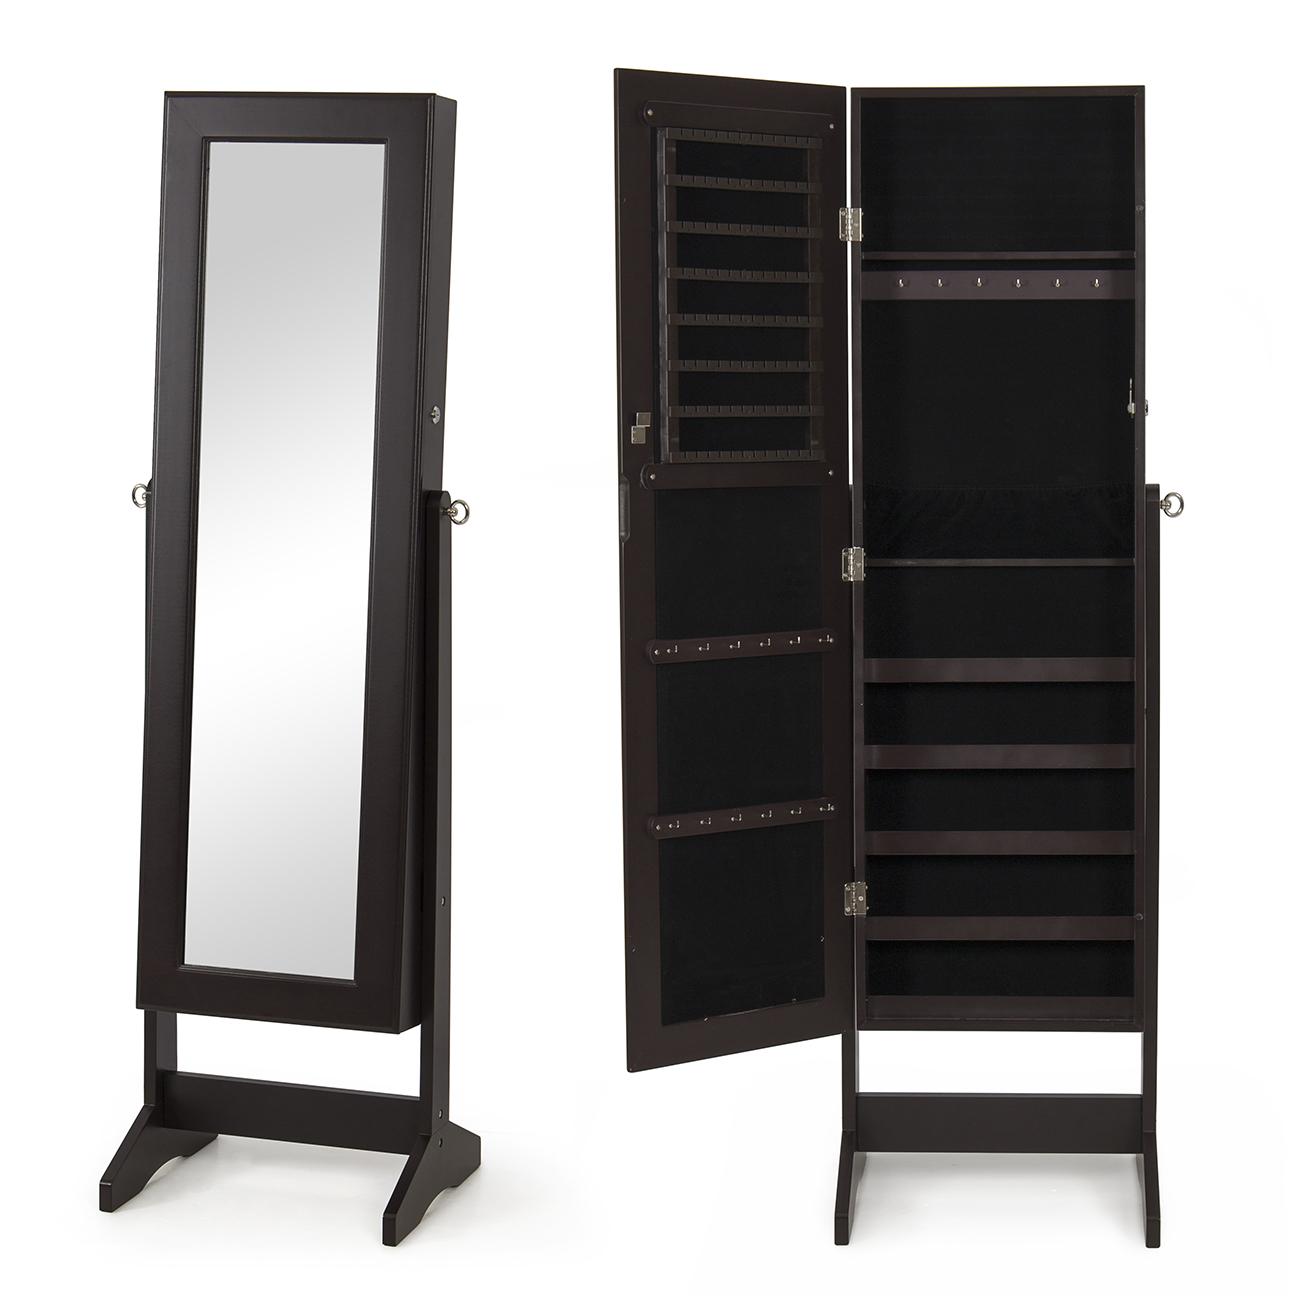 New Mirrored Jewelry Cabinet Mirror W Stand Organizer